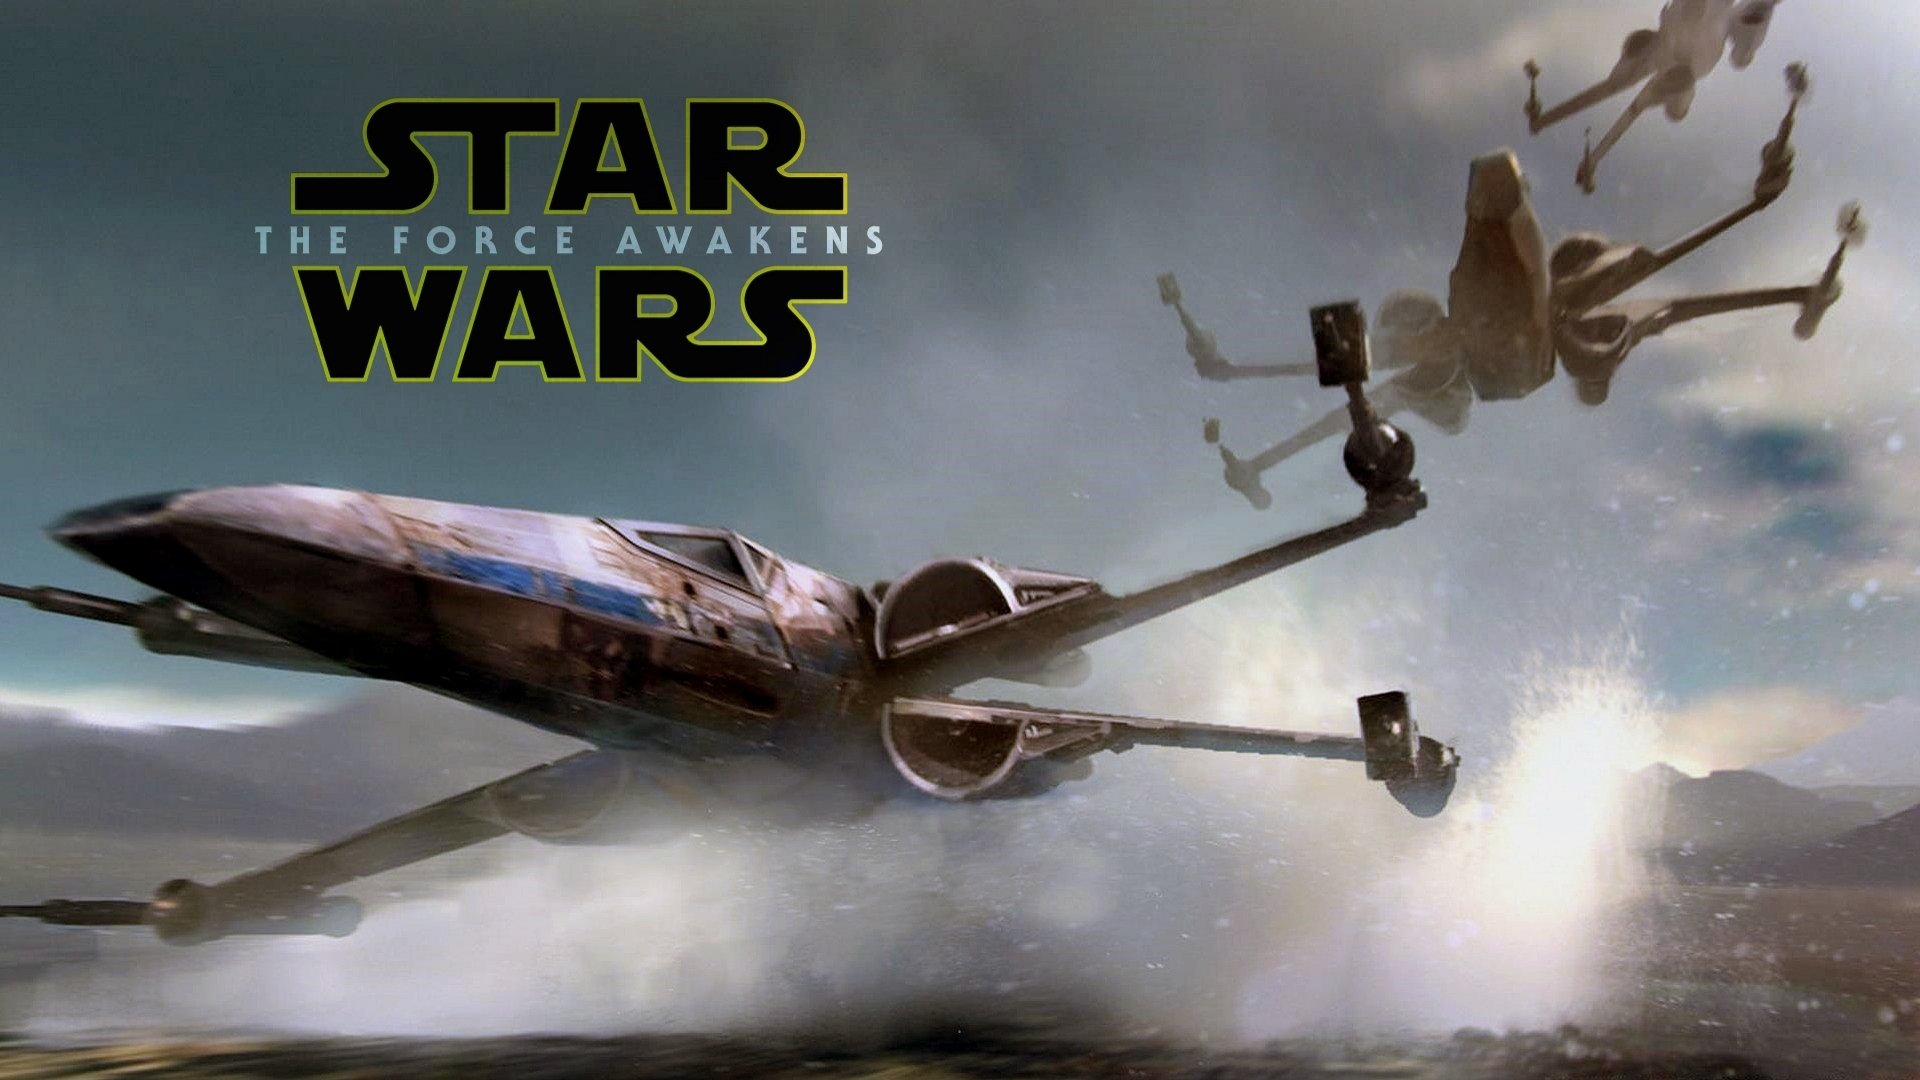 42 Star Wars Wallpaper Force Awakens On Wallpapersafari